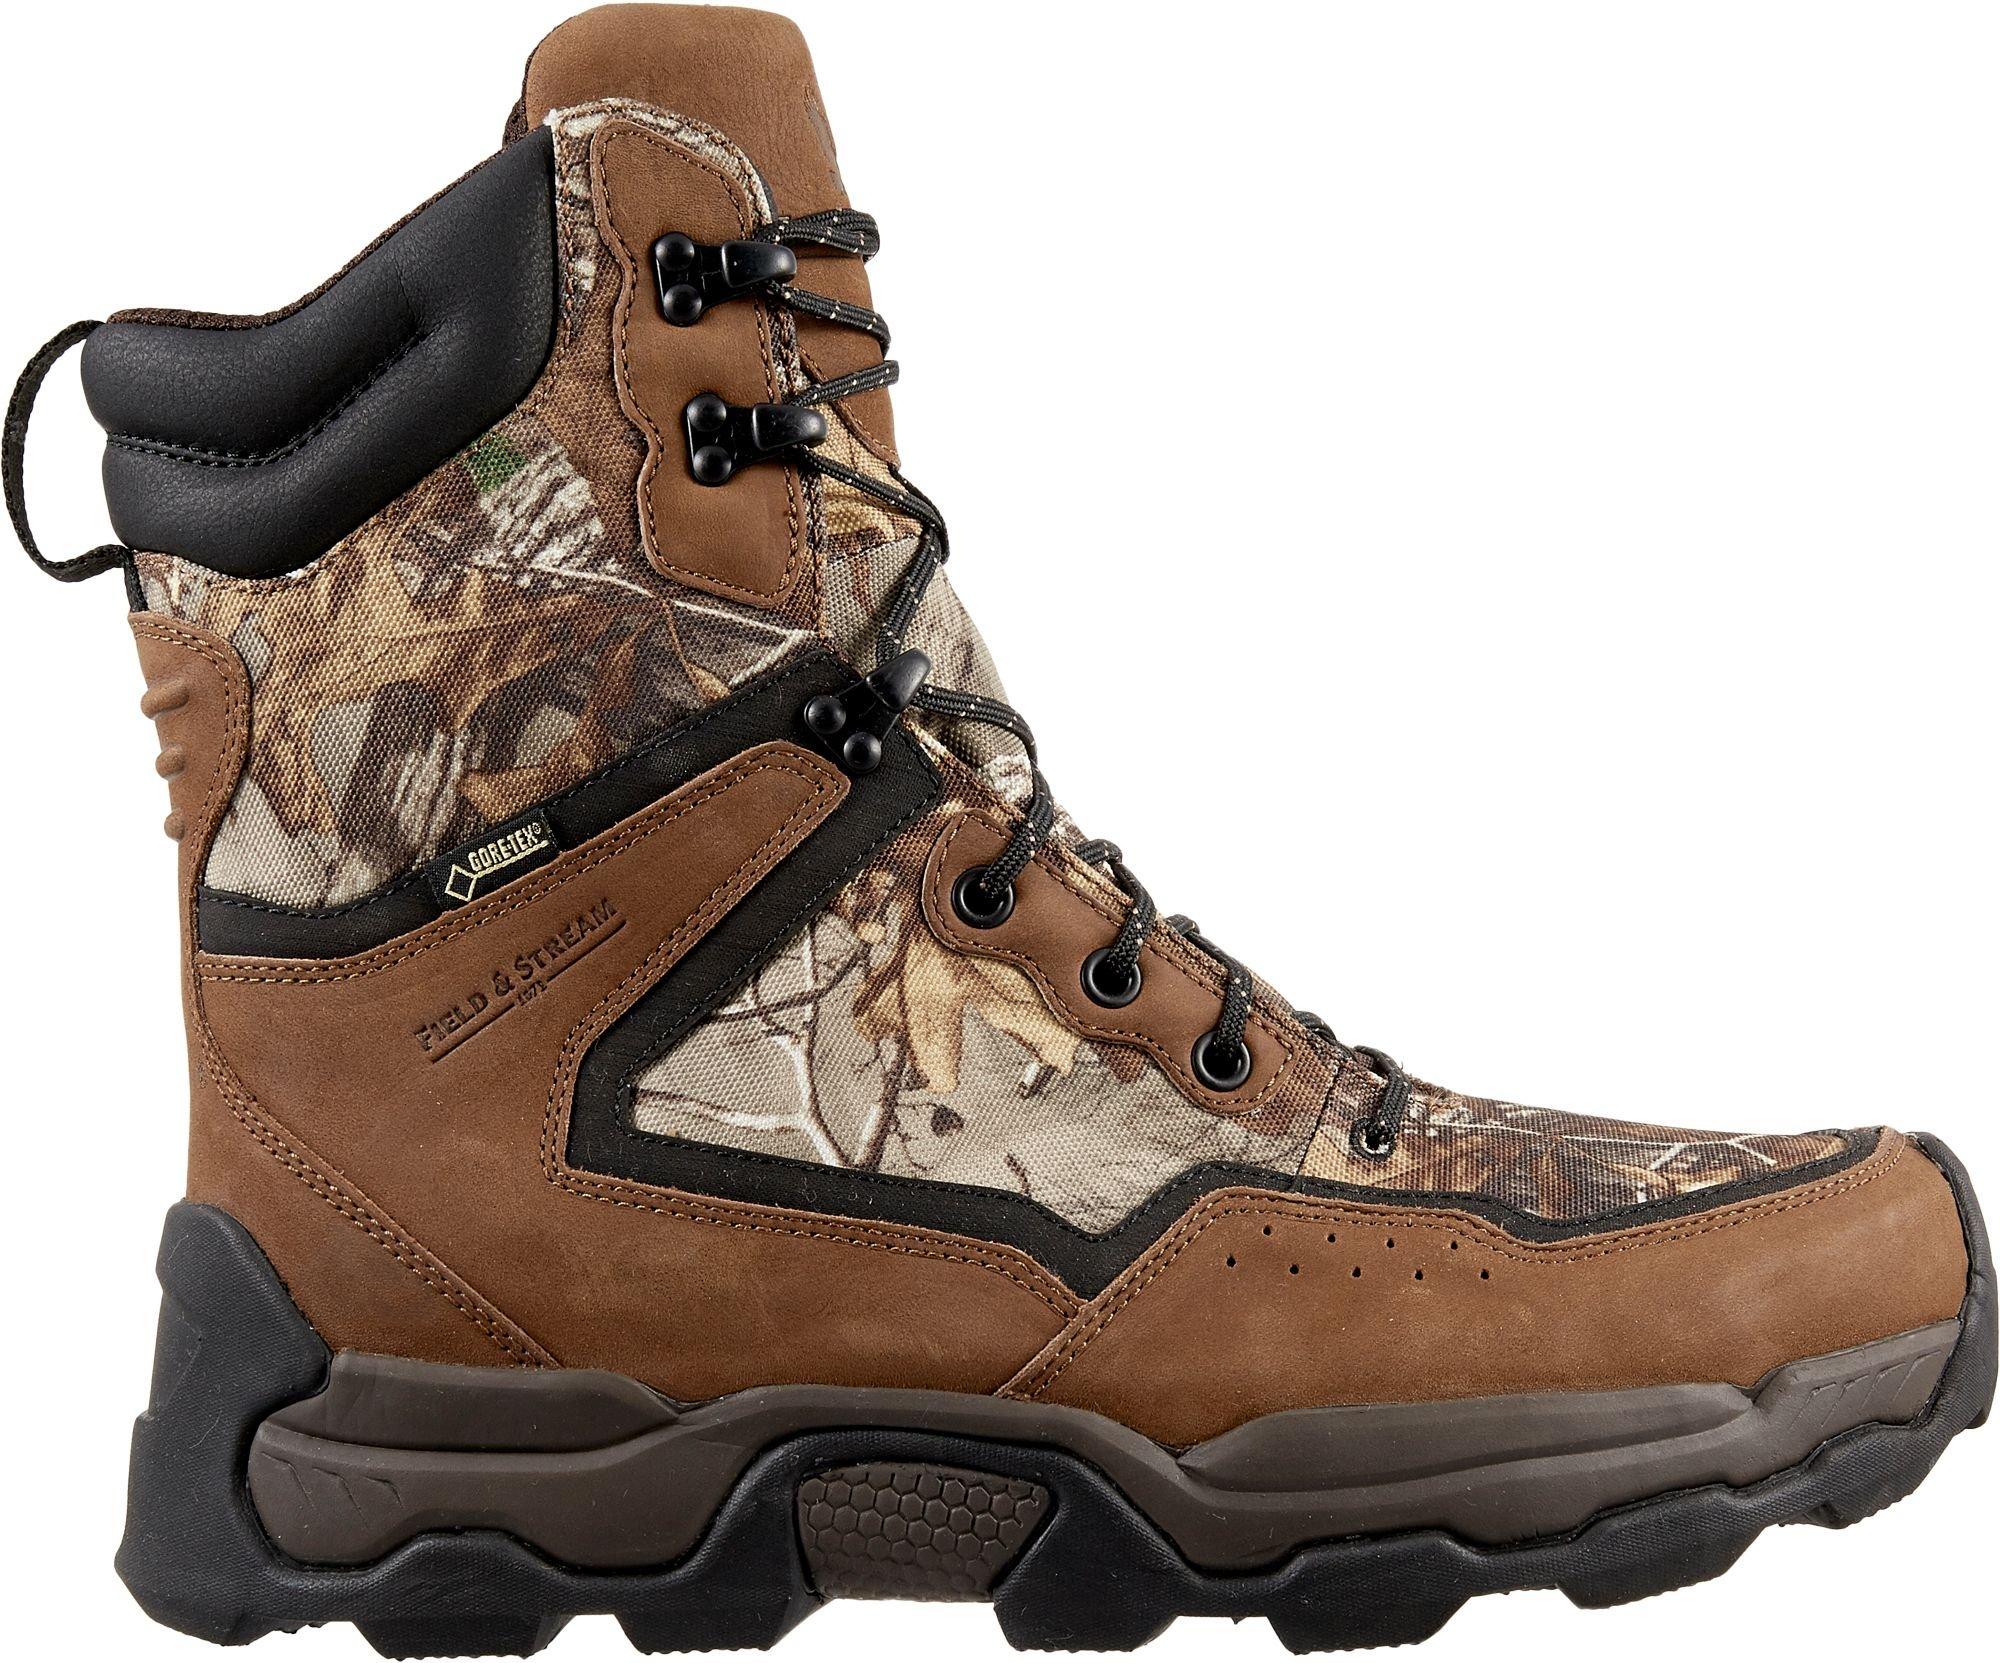 Field & Stream Men's Field Seeker 400g GORE-TEX Hunting Boots (Camo, 12.0 D(M) US) by Field & Stream